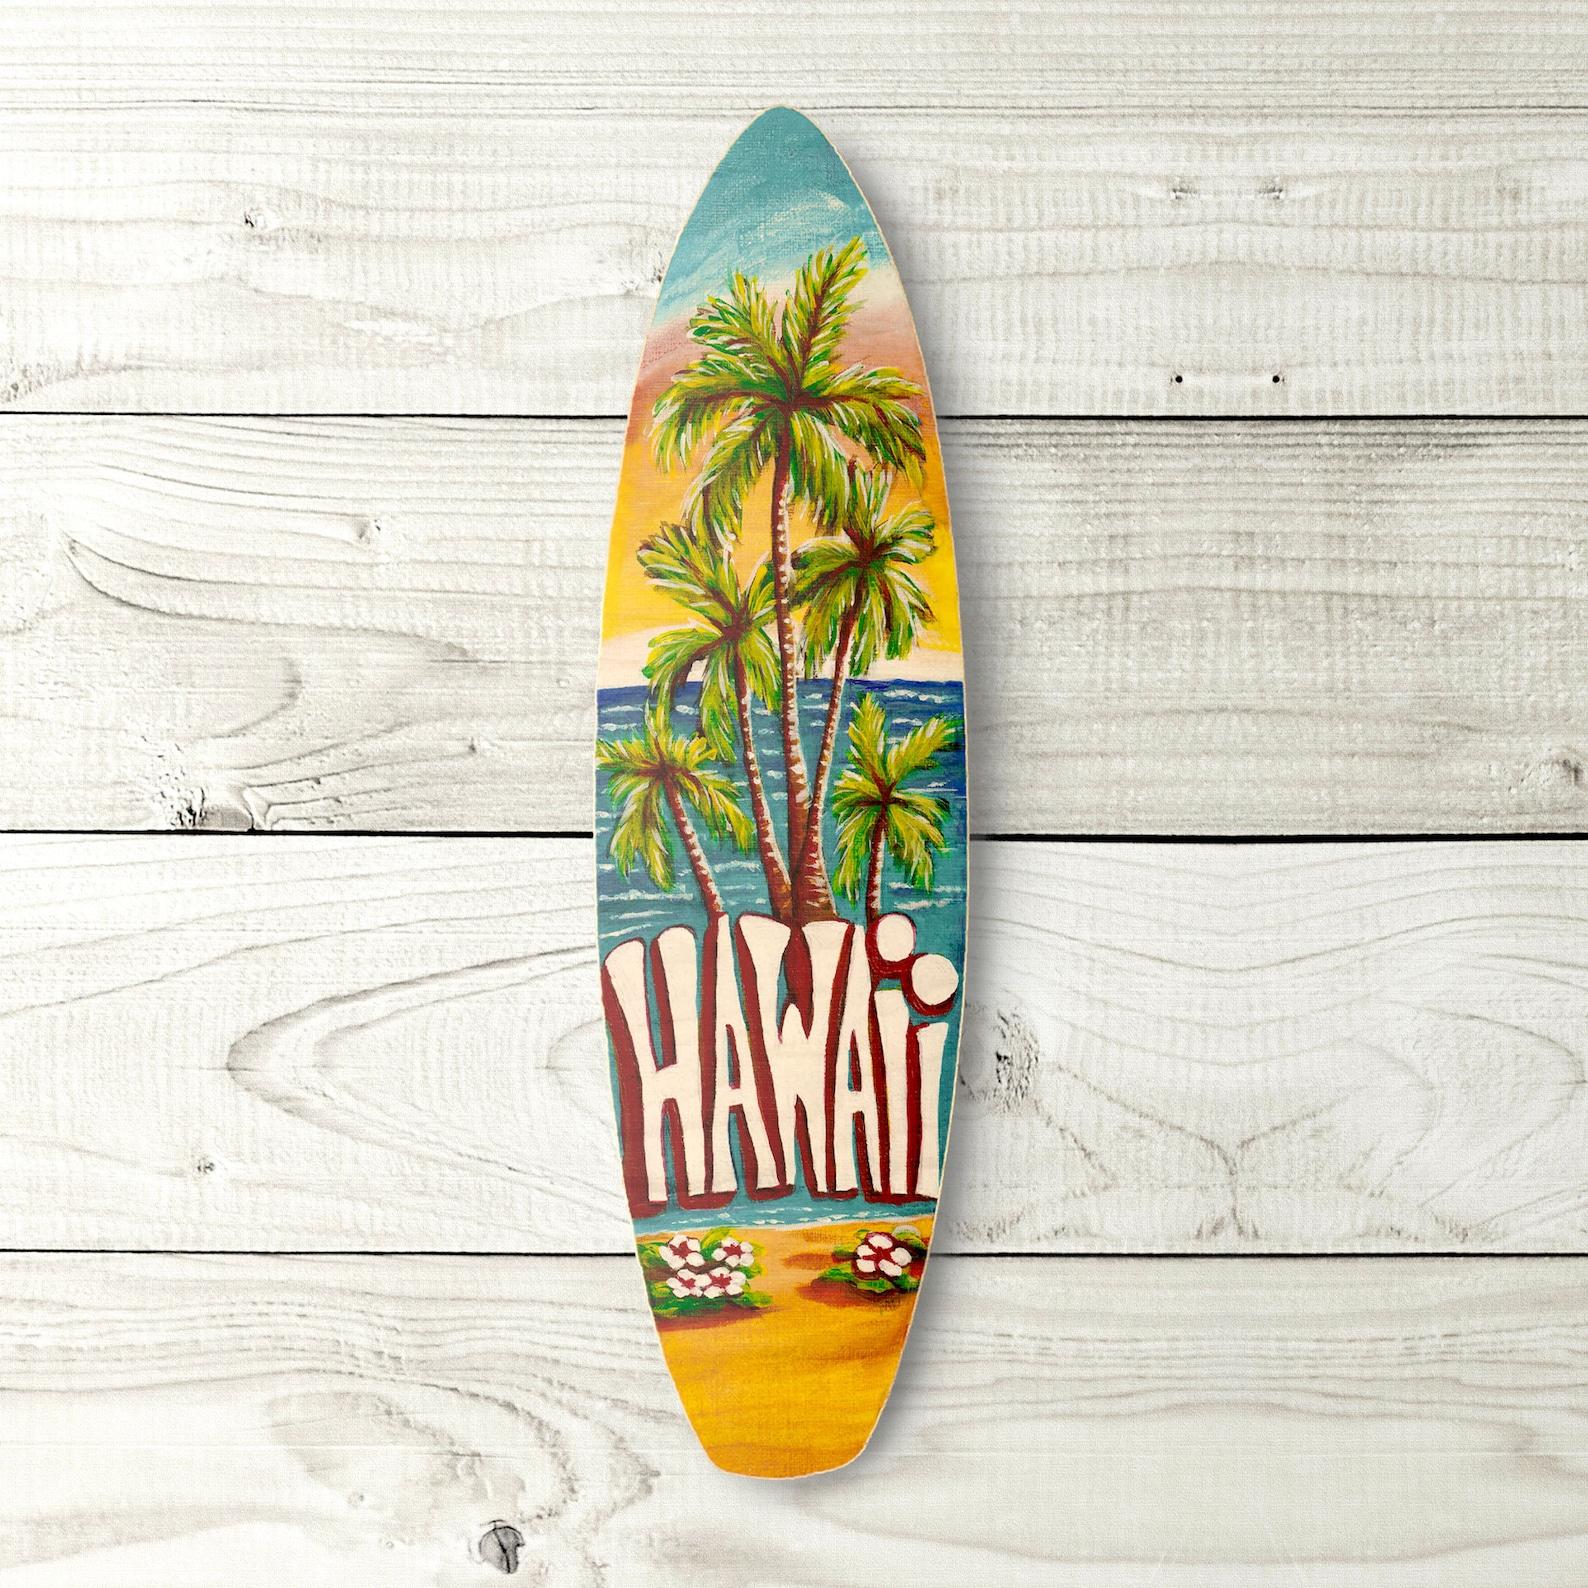 Colorful handpainted wooden surfboard artwork